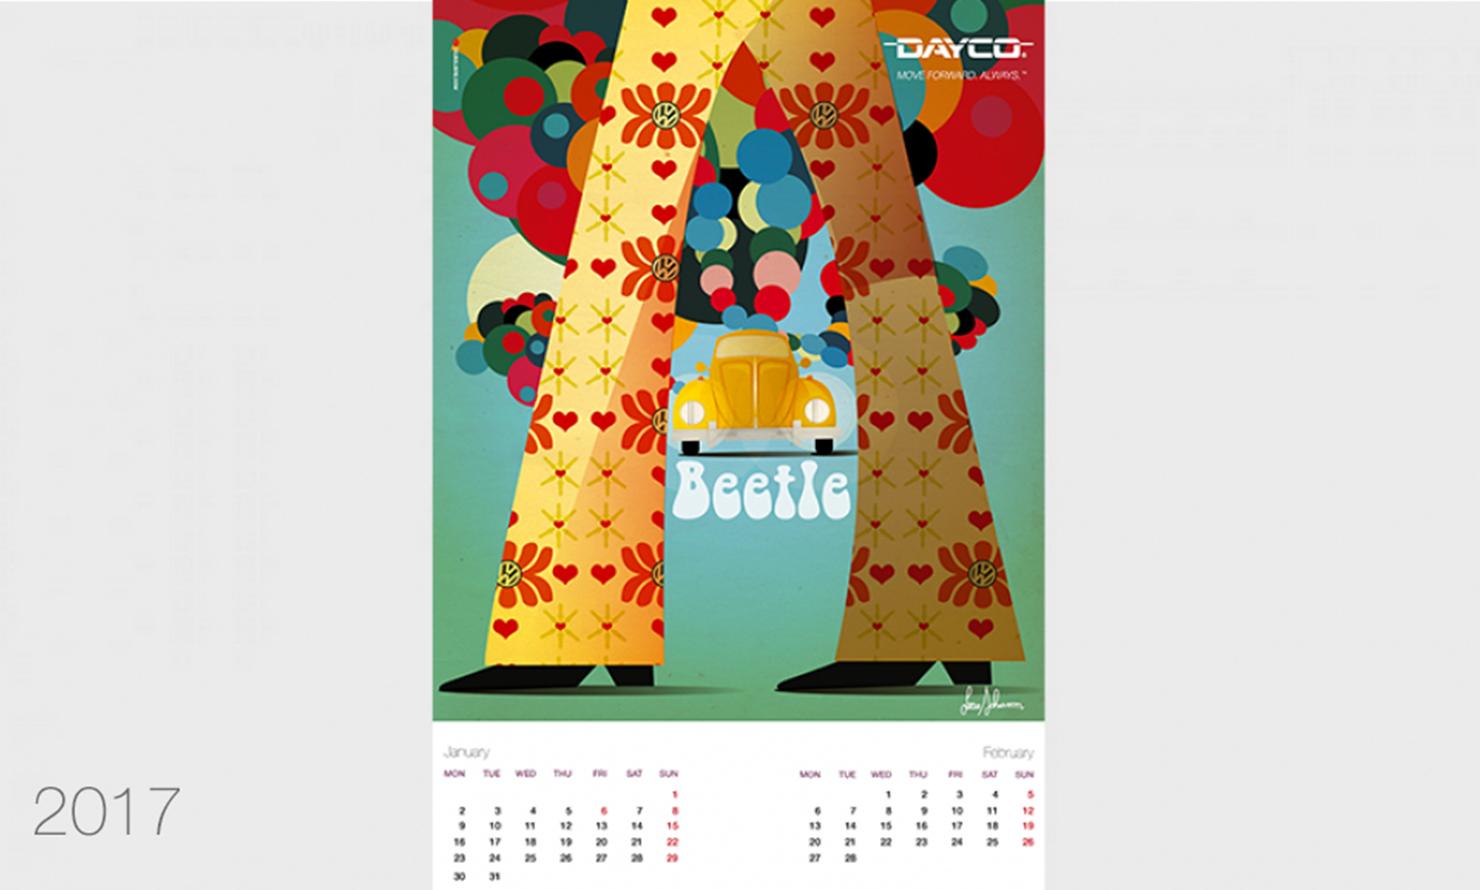 https://www.kubelibre.com/uploads/Slider-work-tutti-clienti/dayco-calendario-2017-1.jpg